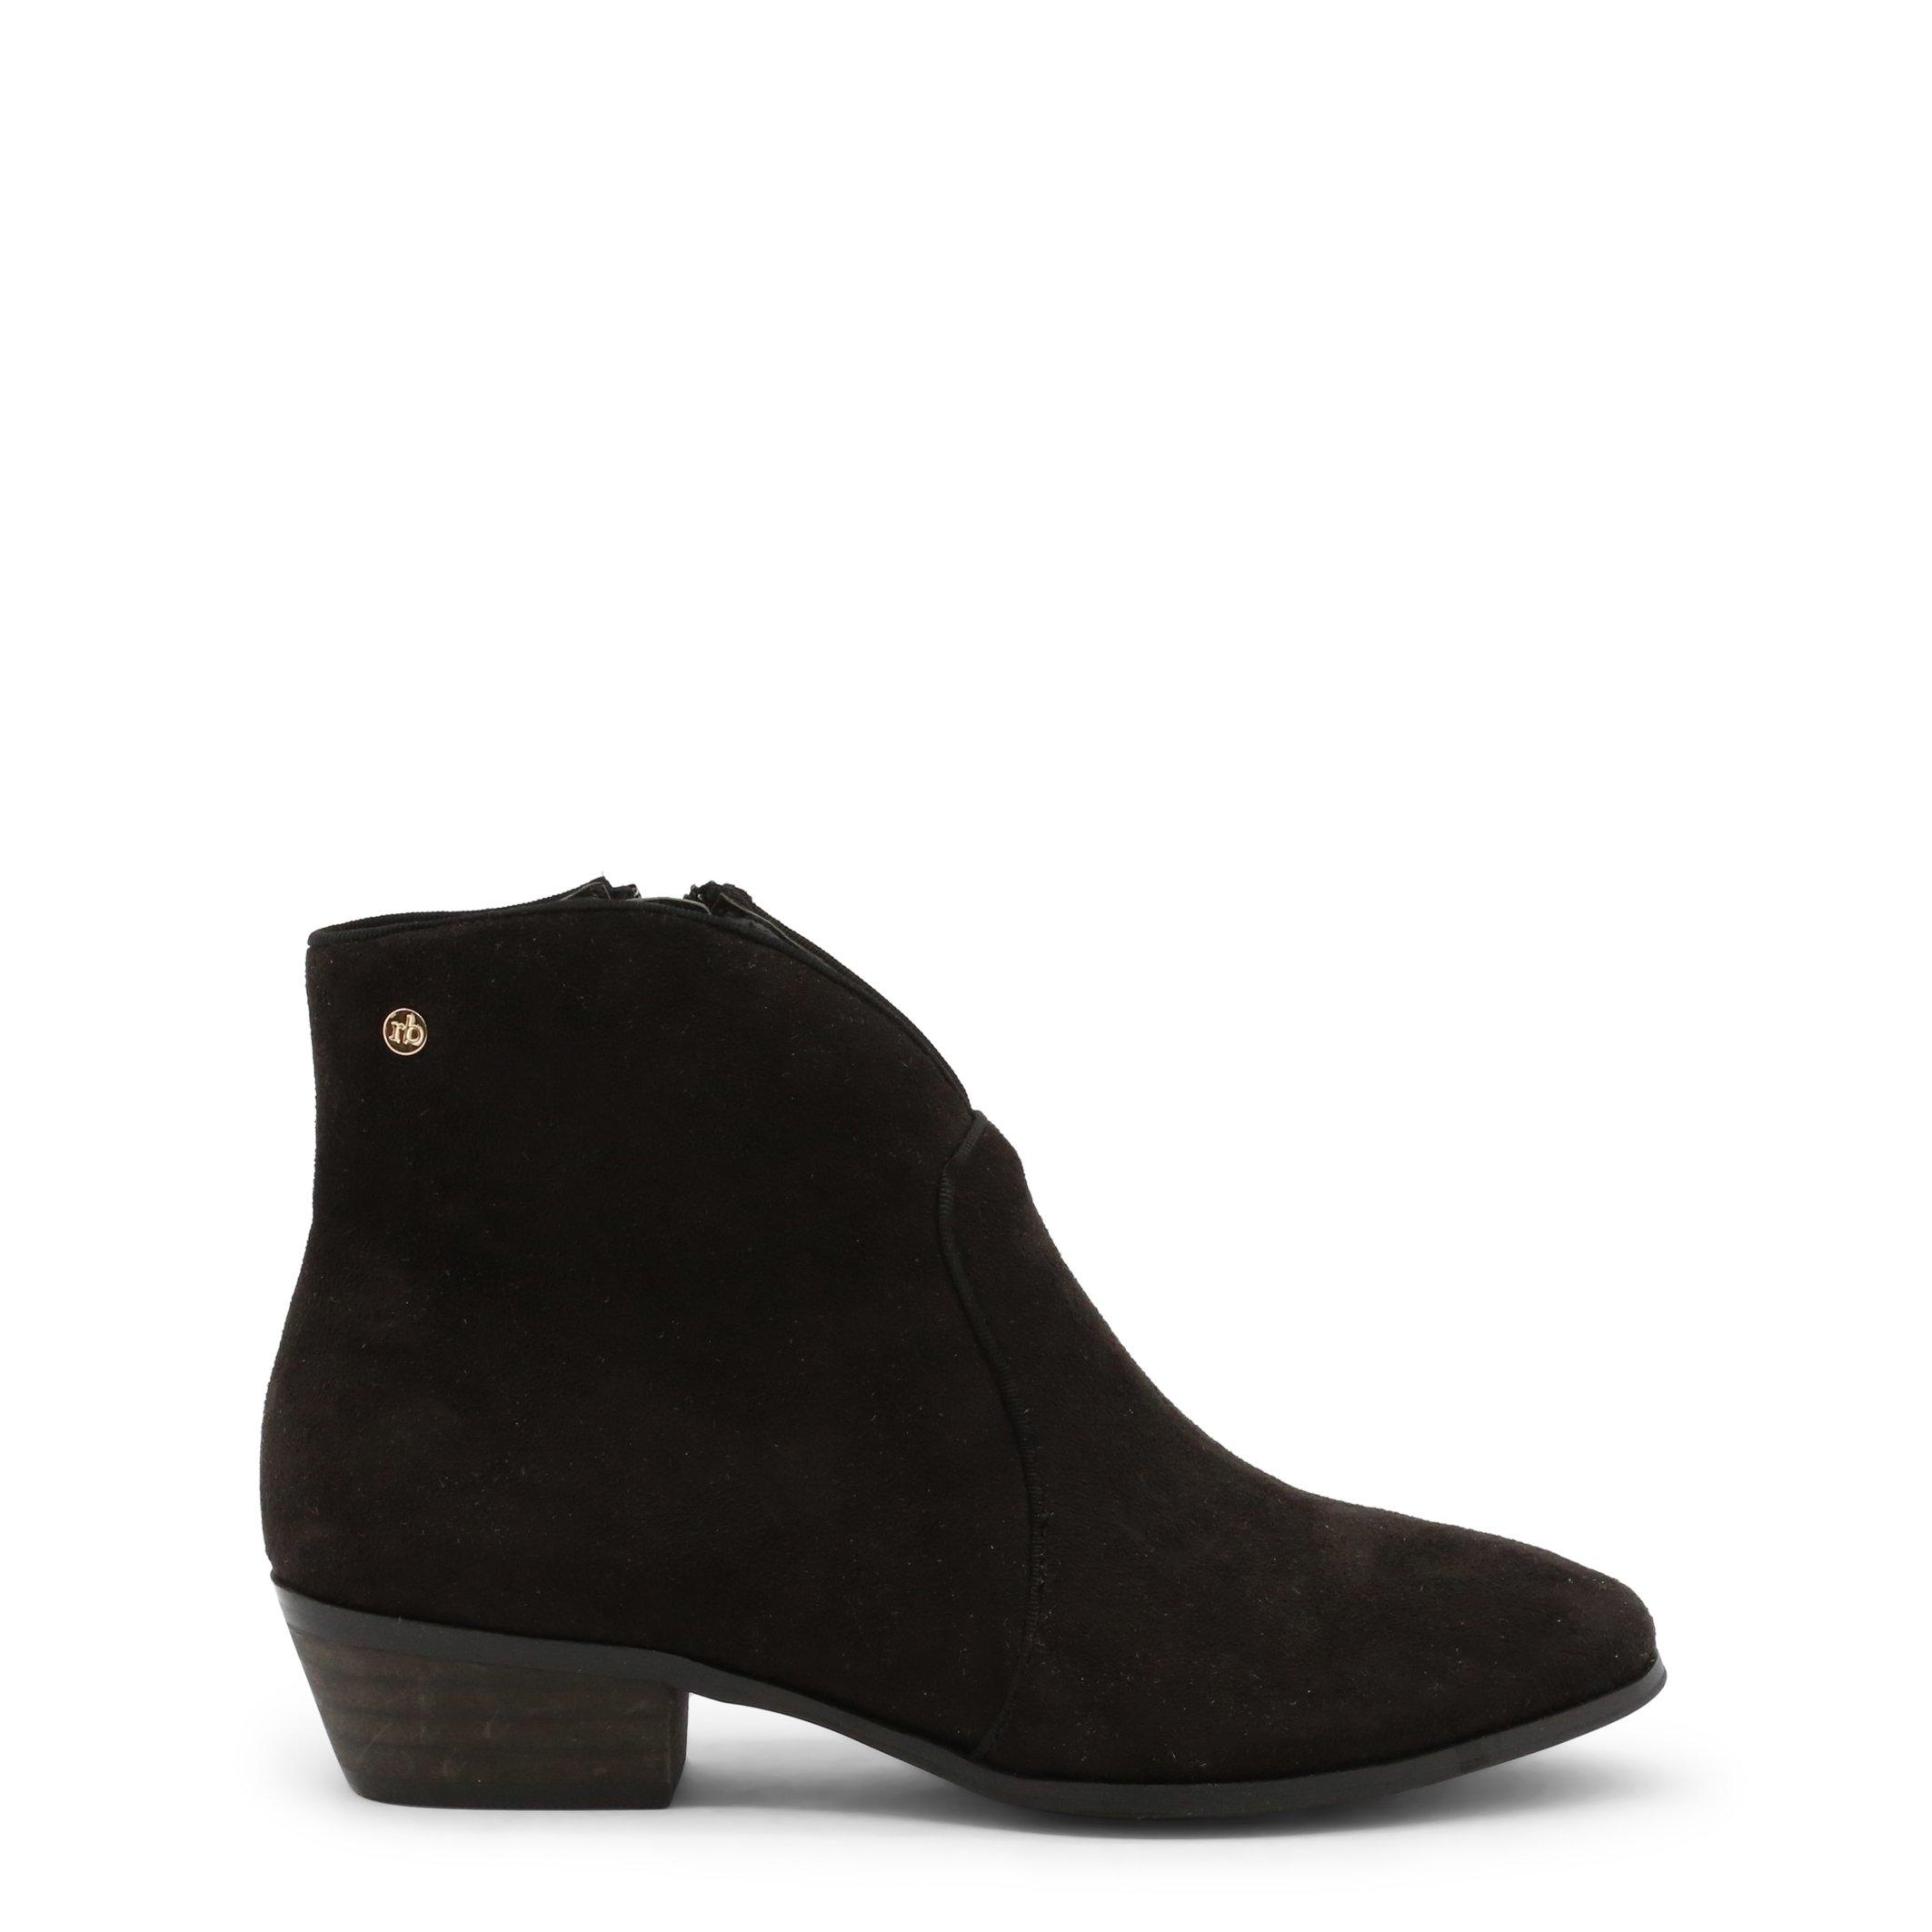 Roccobarocco Women's Ankle Boot Various Colours RBSC1JJ01STD - black EU 37